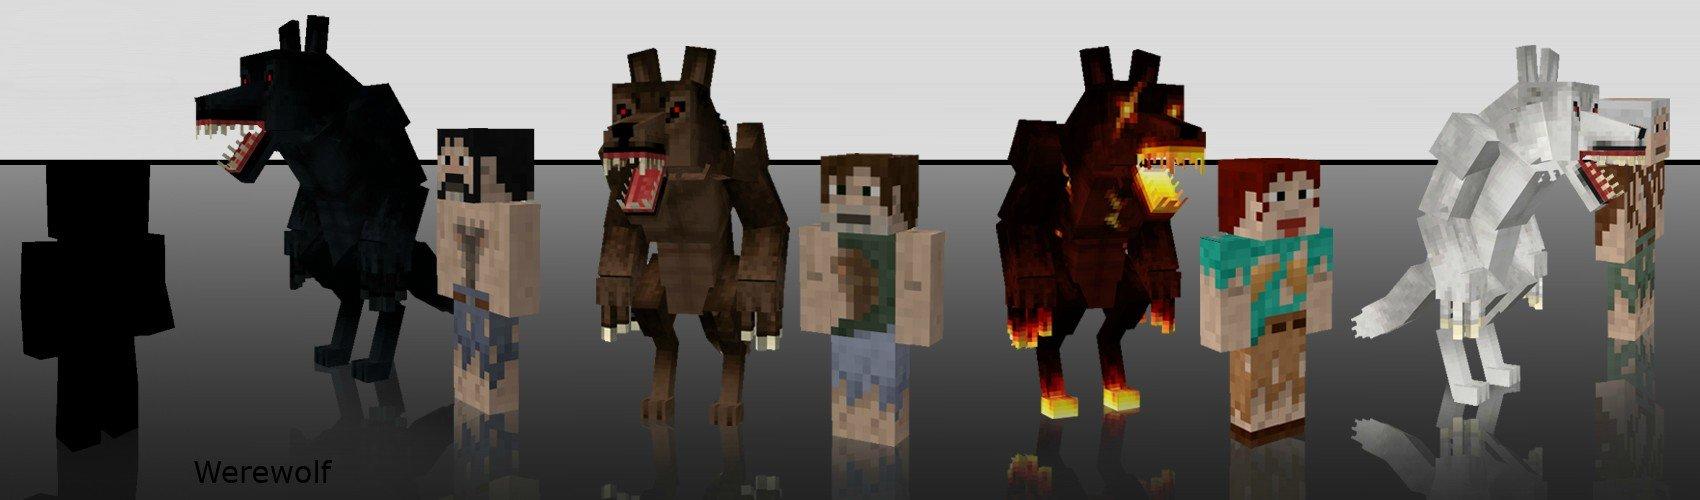 Mo-Creatures-wilkołak